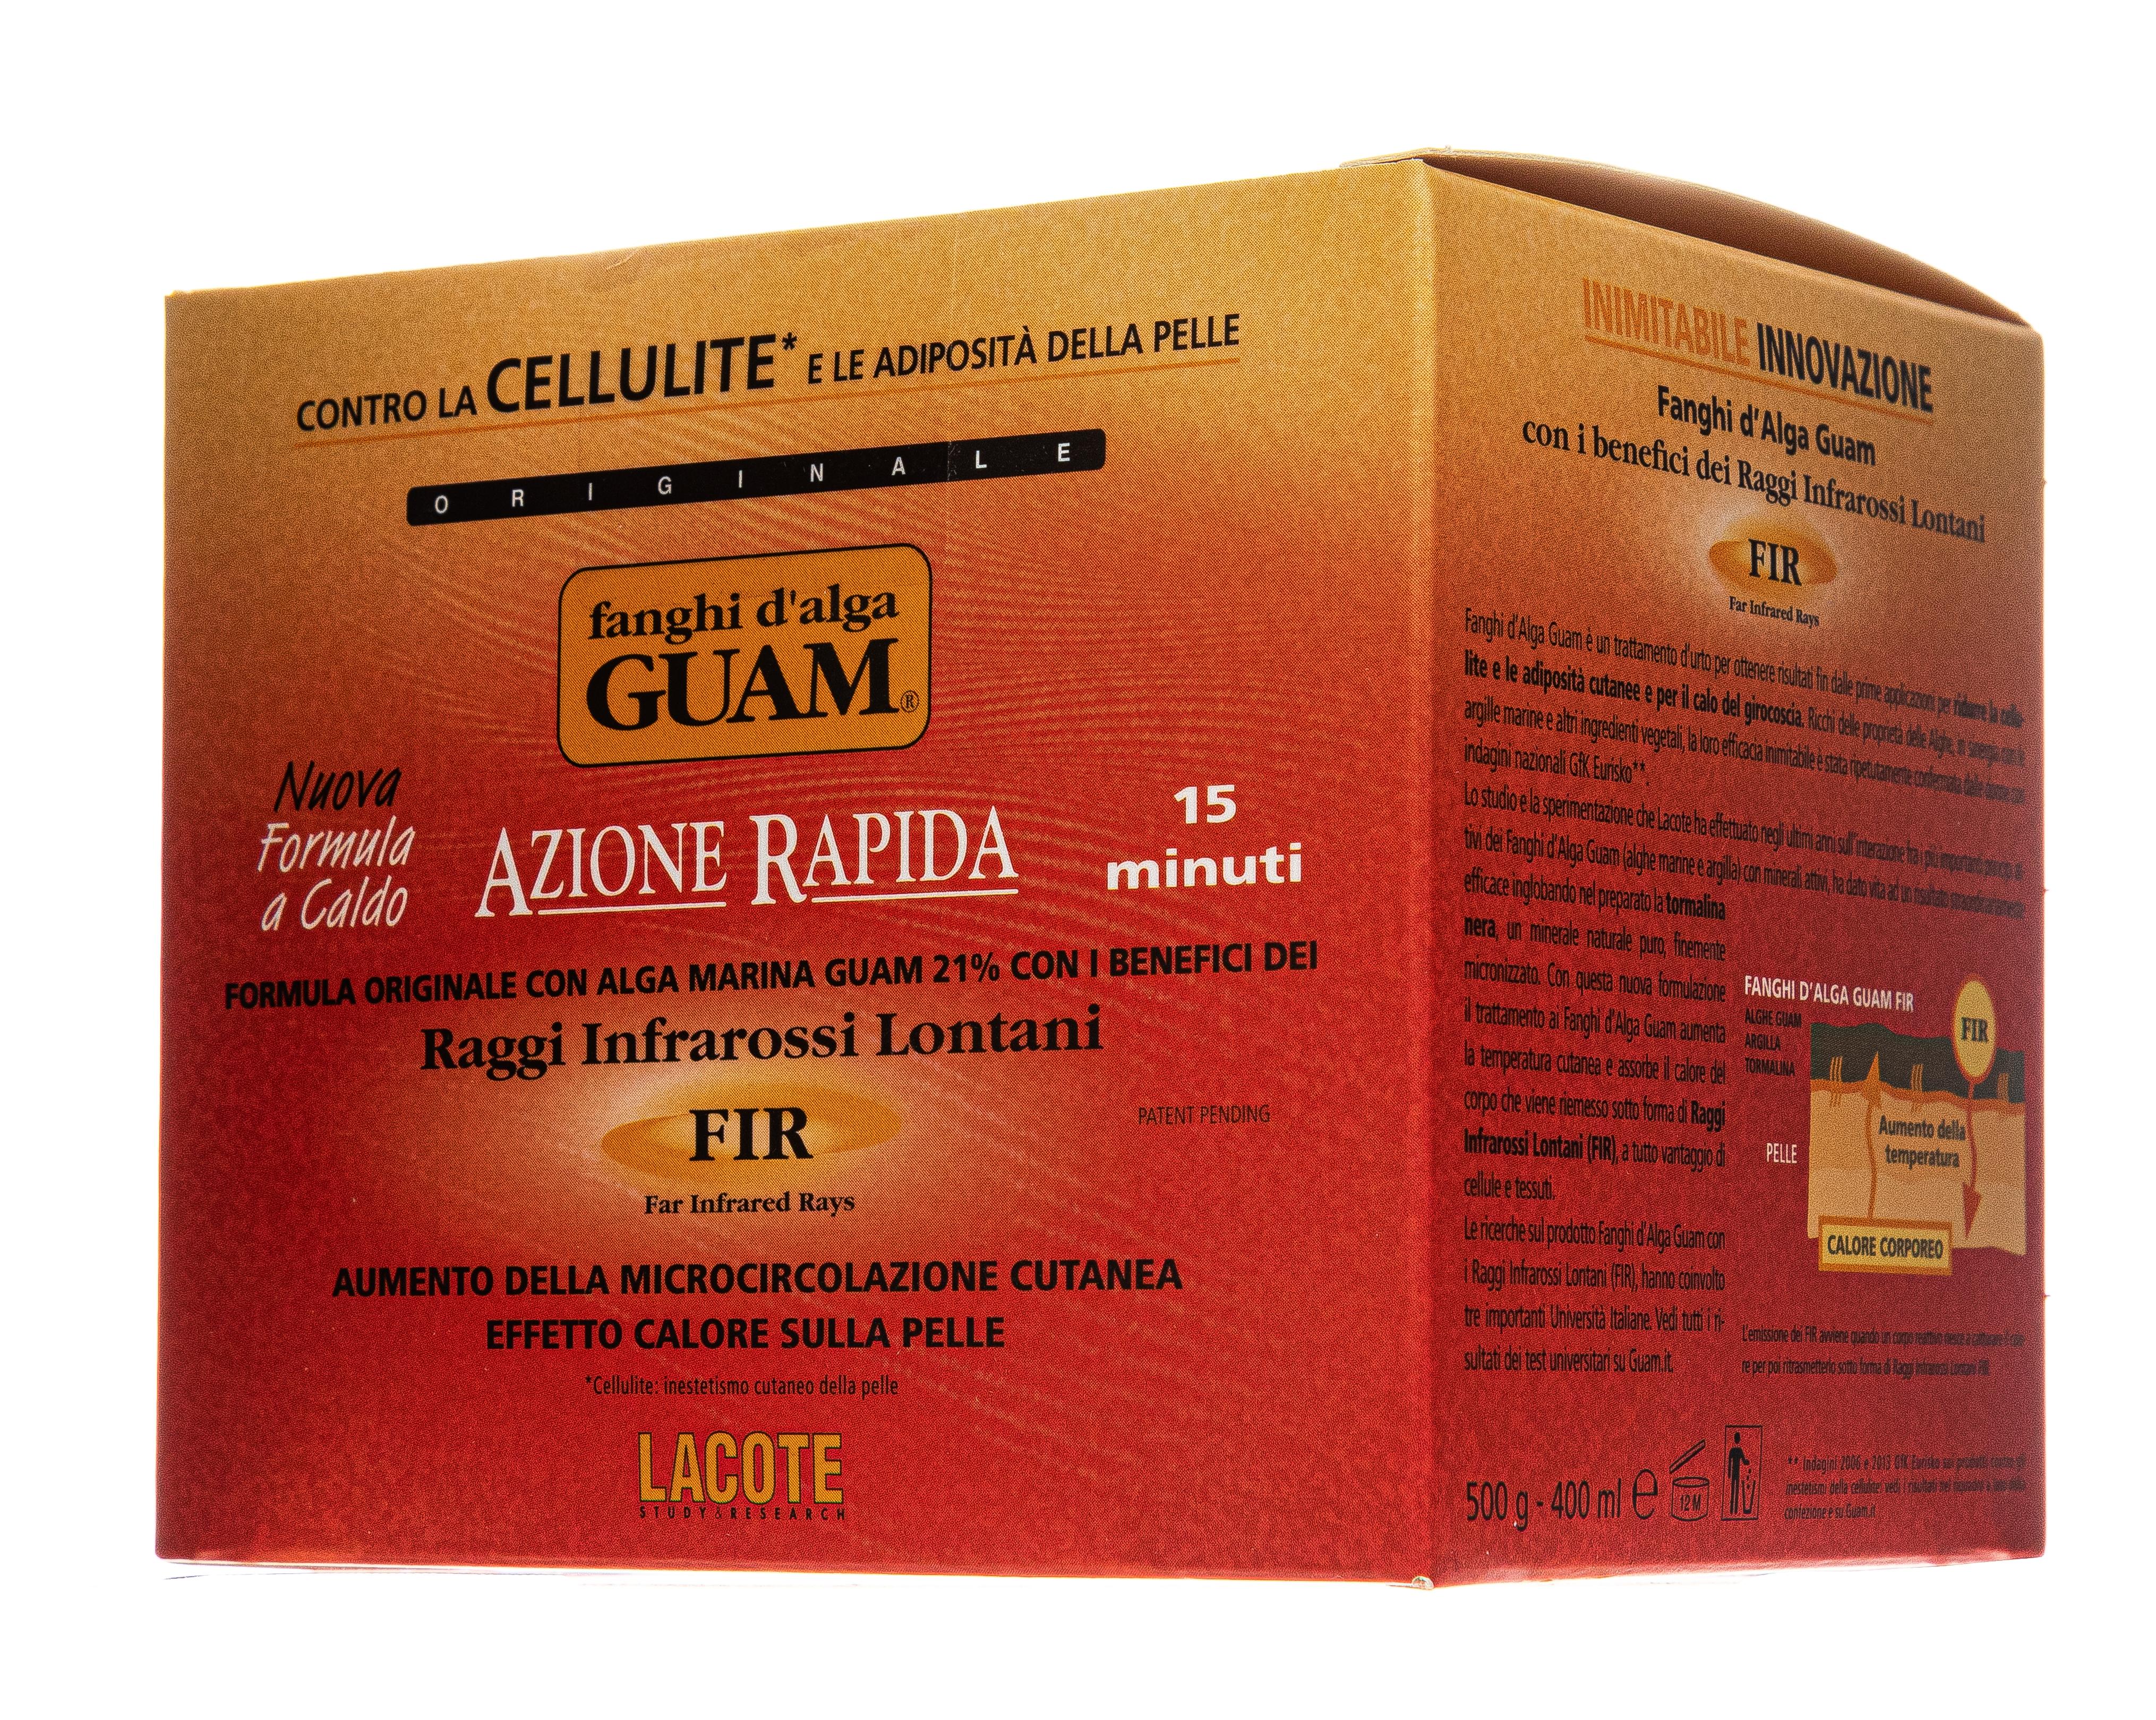 GUAM Маска Fir Антицеллюлитная Активная с Микрокристаллами Турмалина, 500г маска антицеллюлитная активная с микрокристаллами турмалина guam fir 500 мл